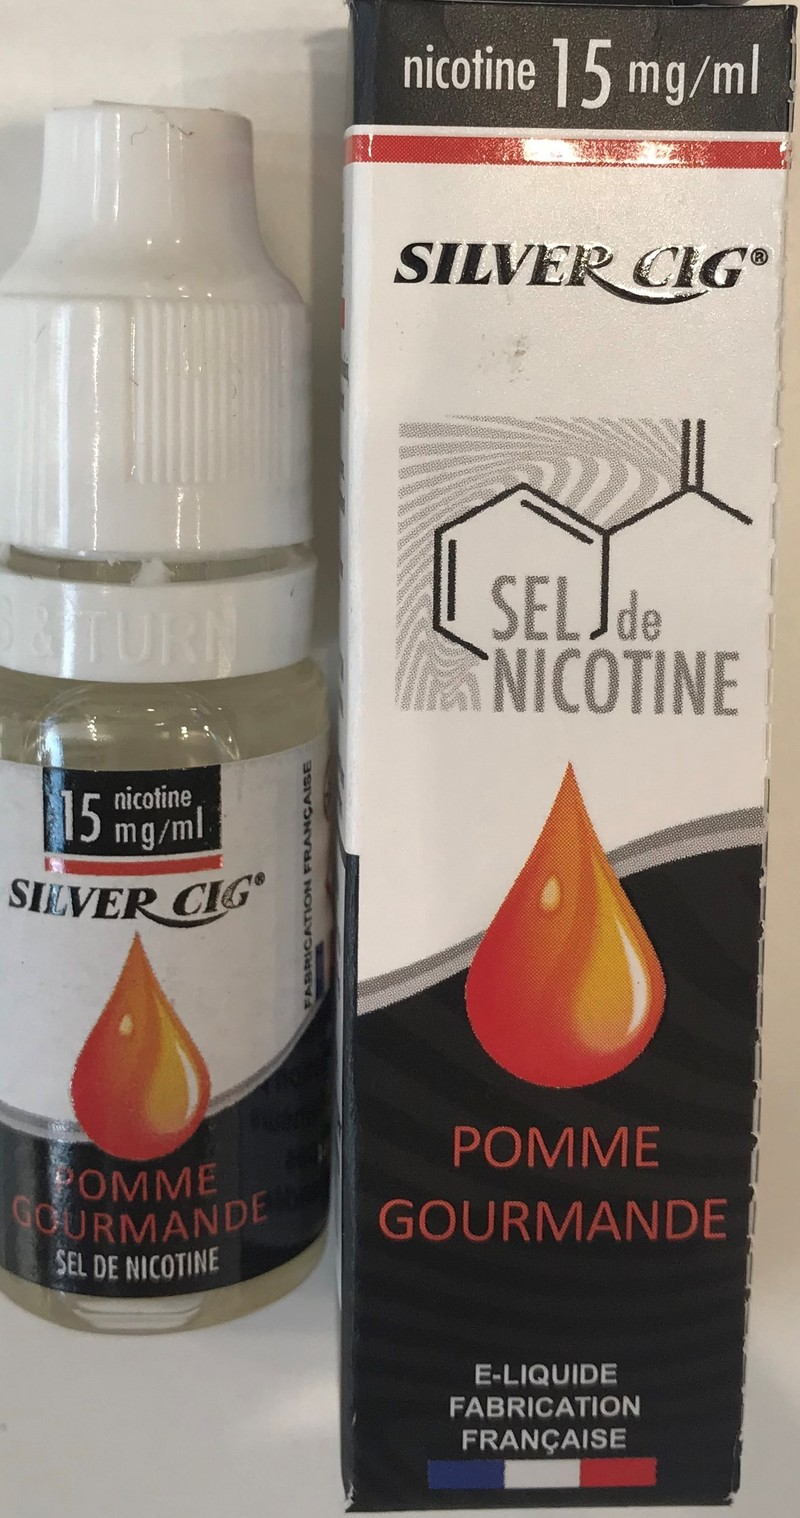 E-liquide Sel de nicotine Pomme gourmande - SILVER CIG - LE BRAZZA  - Voir en grand